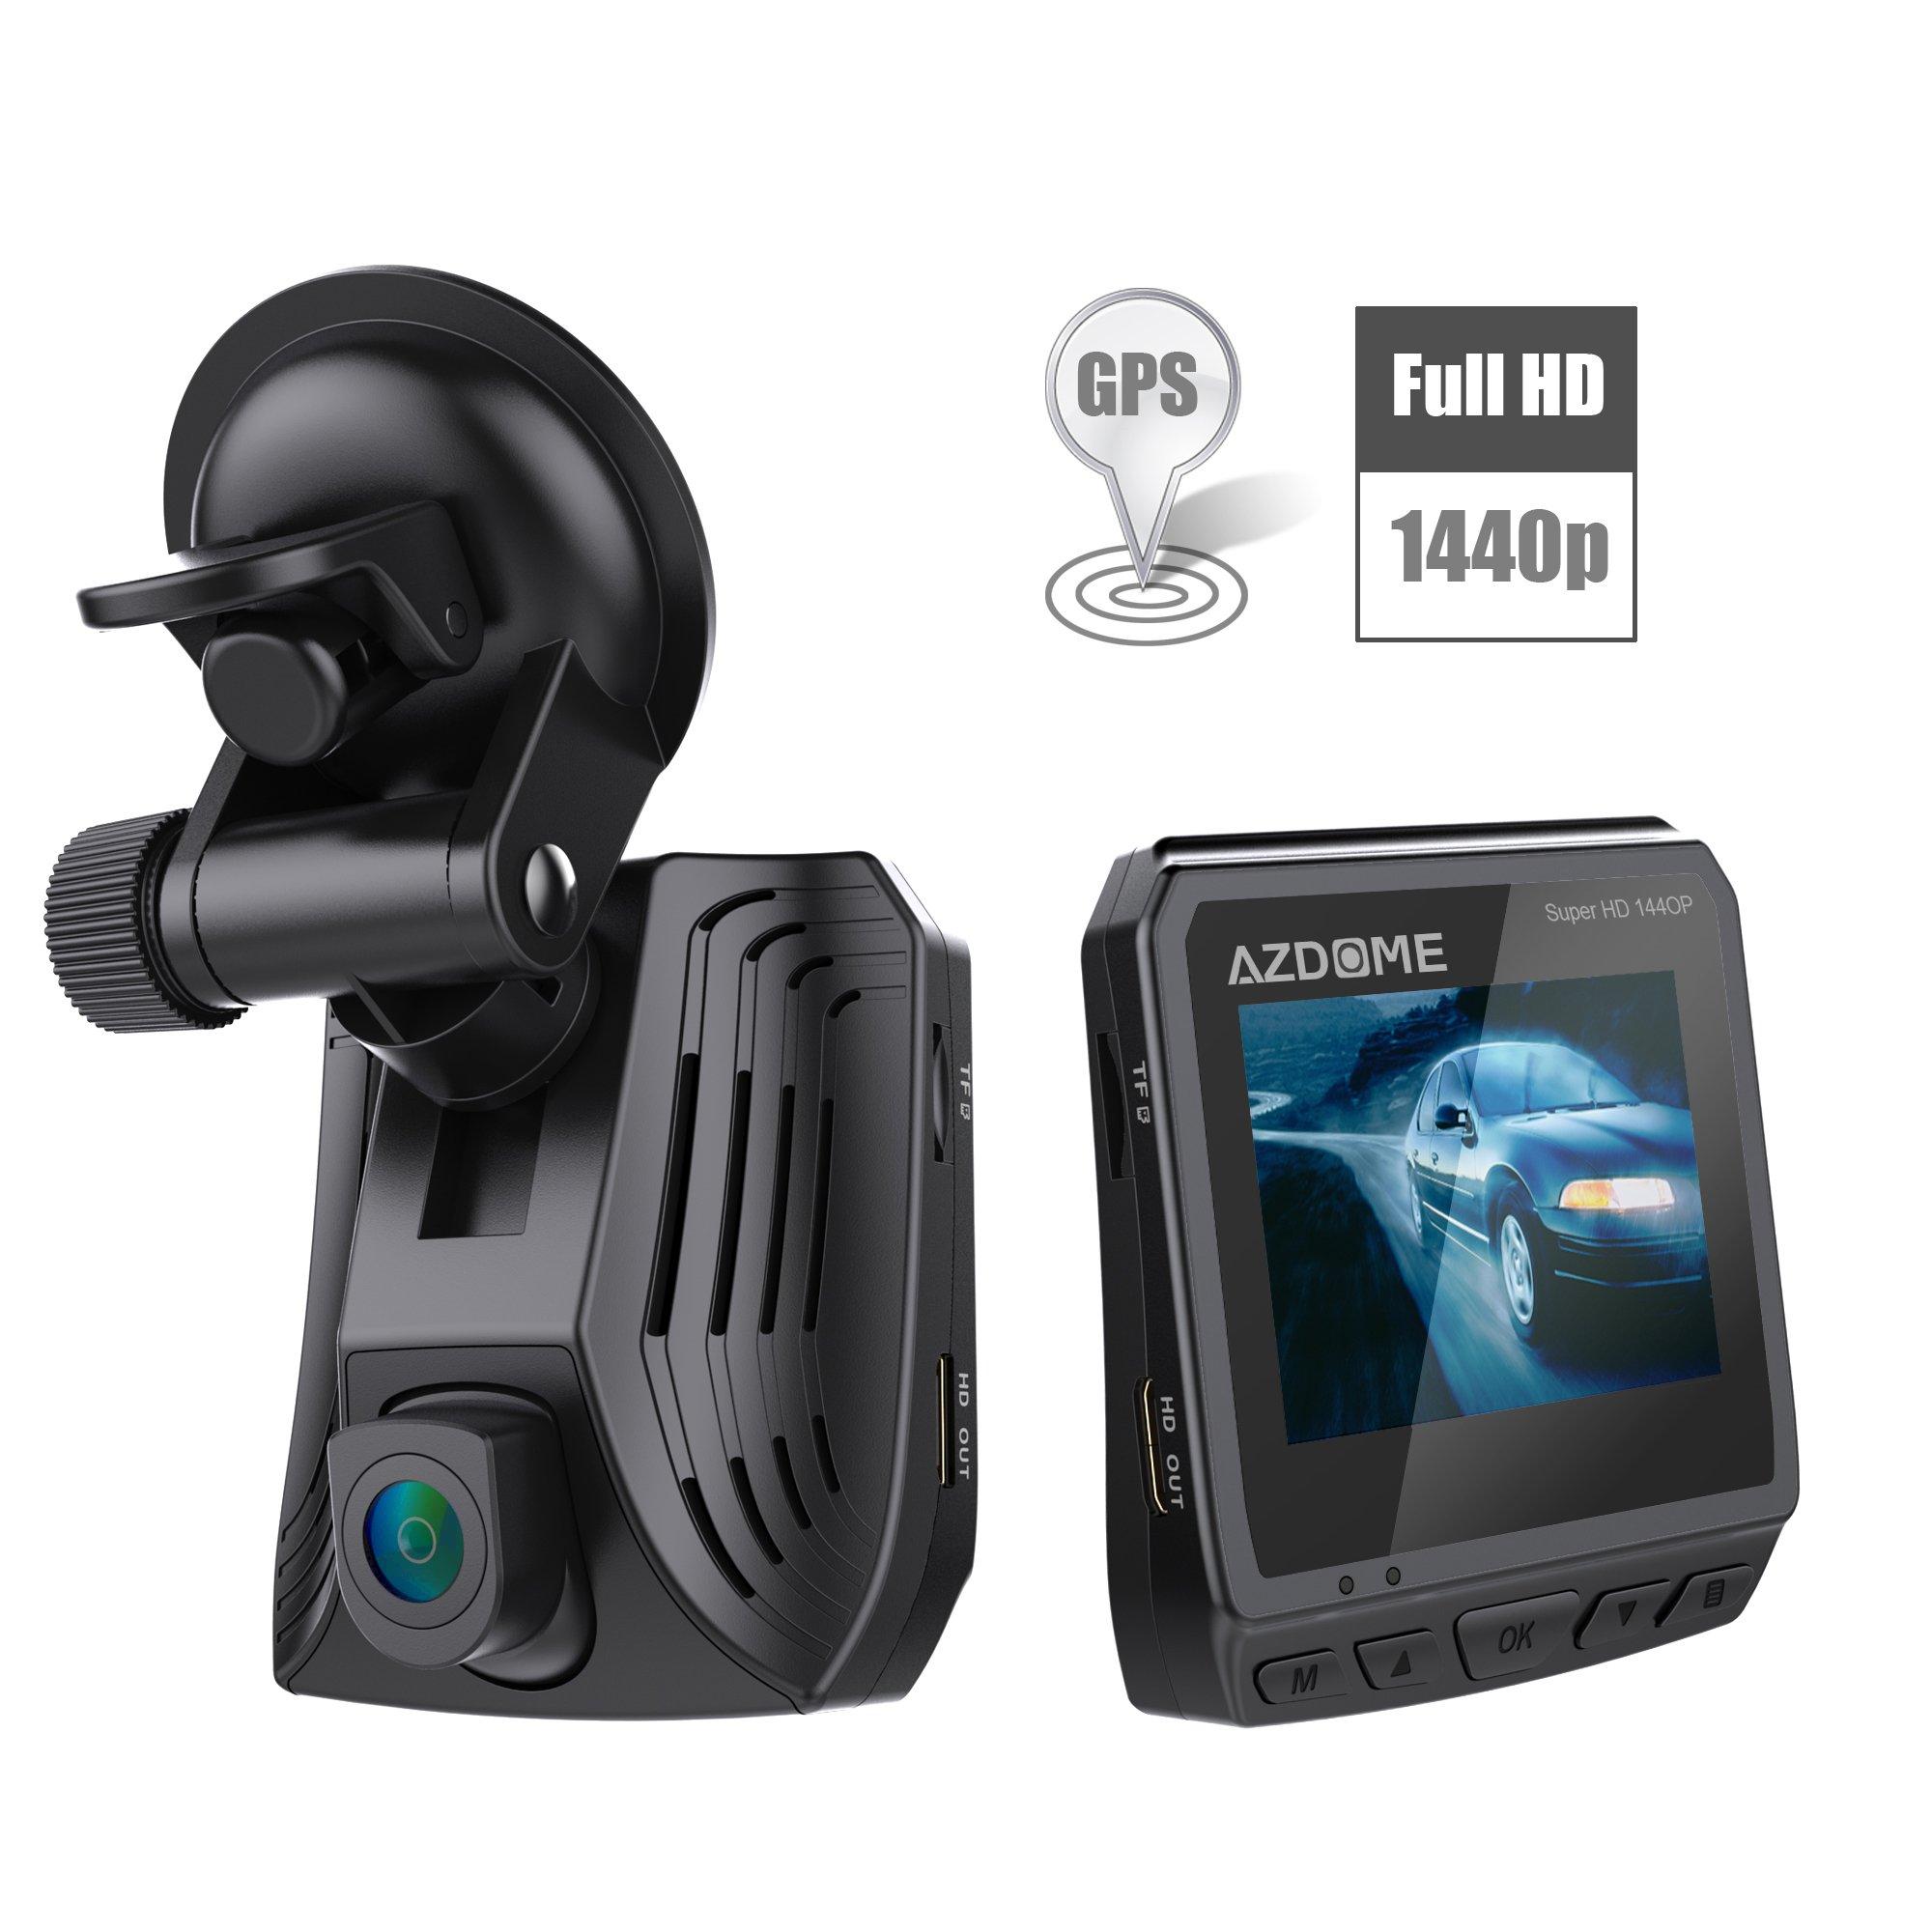 Vomach Mini Dash Cam, Super HD 1440P High Resolution video, G-Sensor, SOS Emergency Saving, ADAS, lDWS, FCWS, GPS tracking, HDMI Output etc. function Black by Vomach